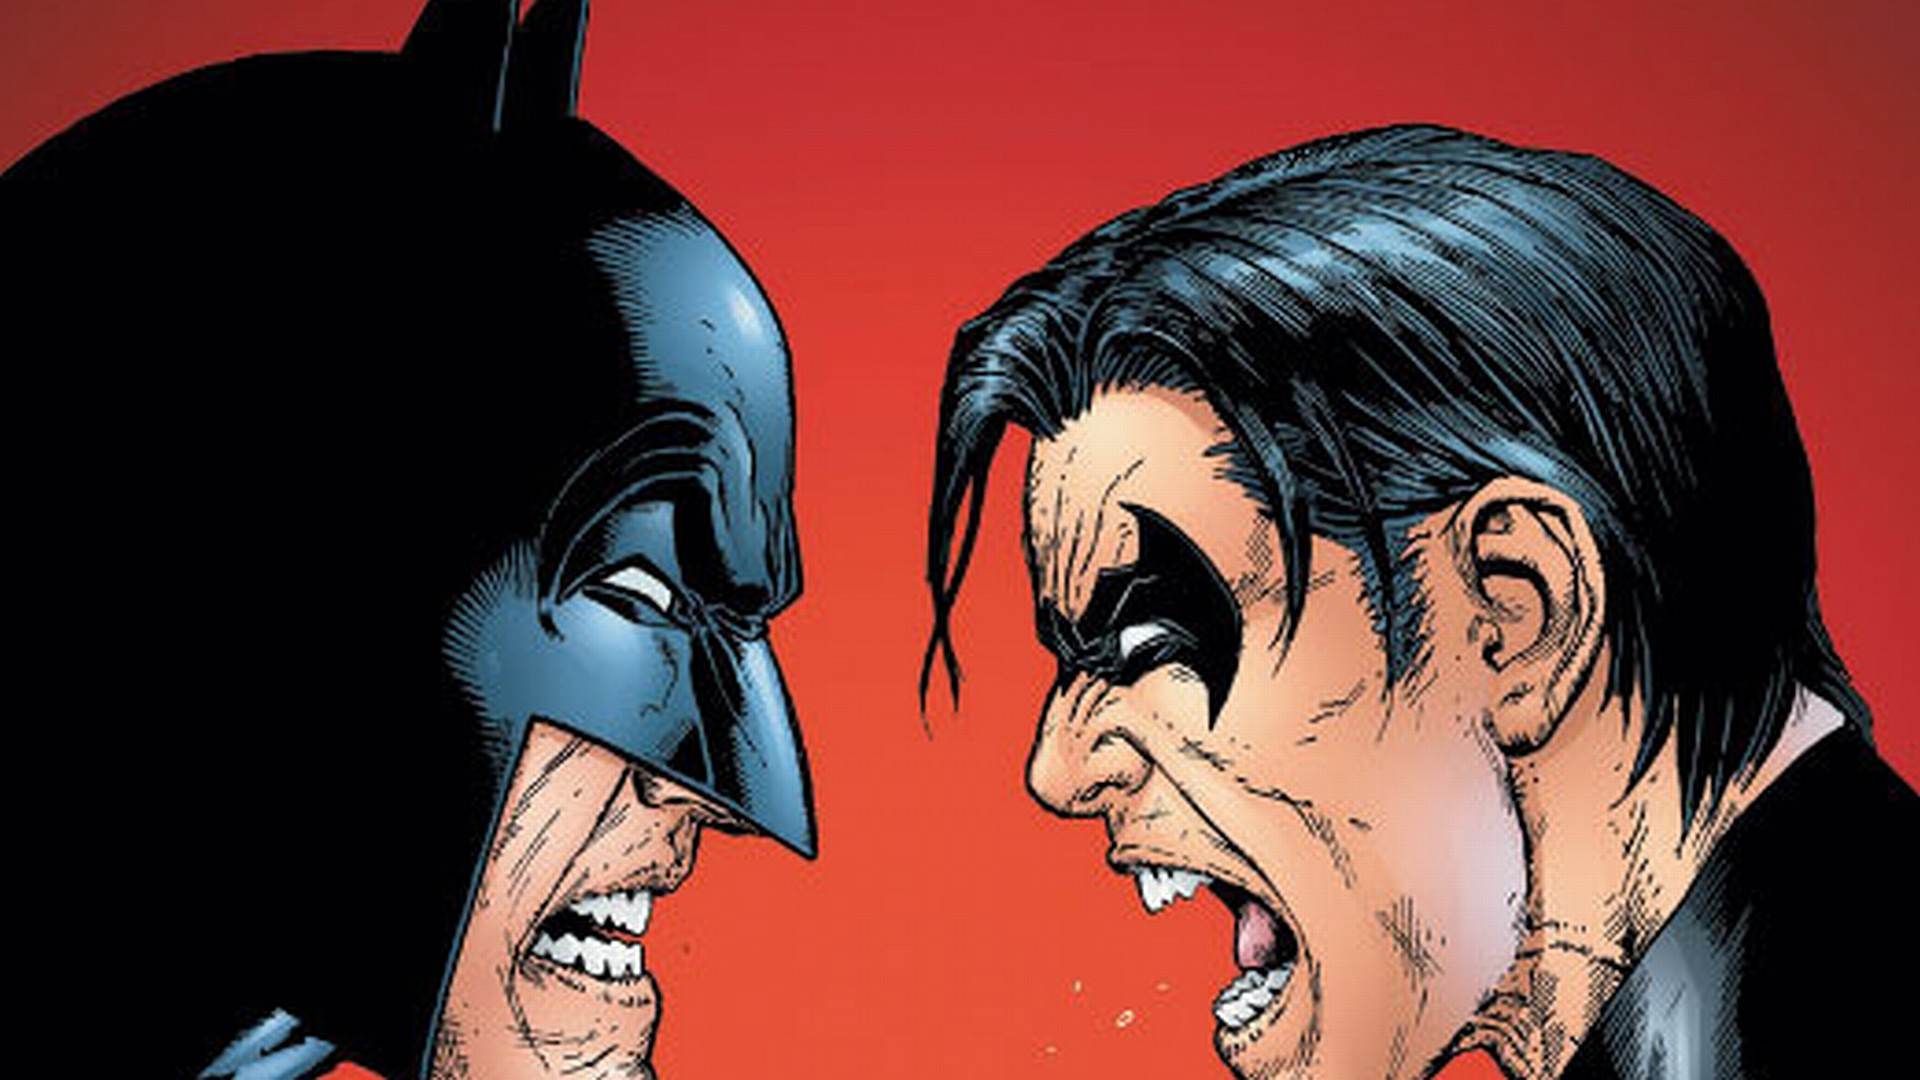 Comics – Nightwing Batman Wallpaper